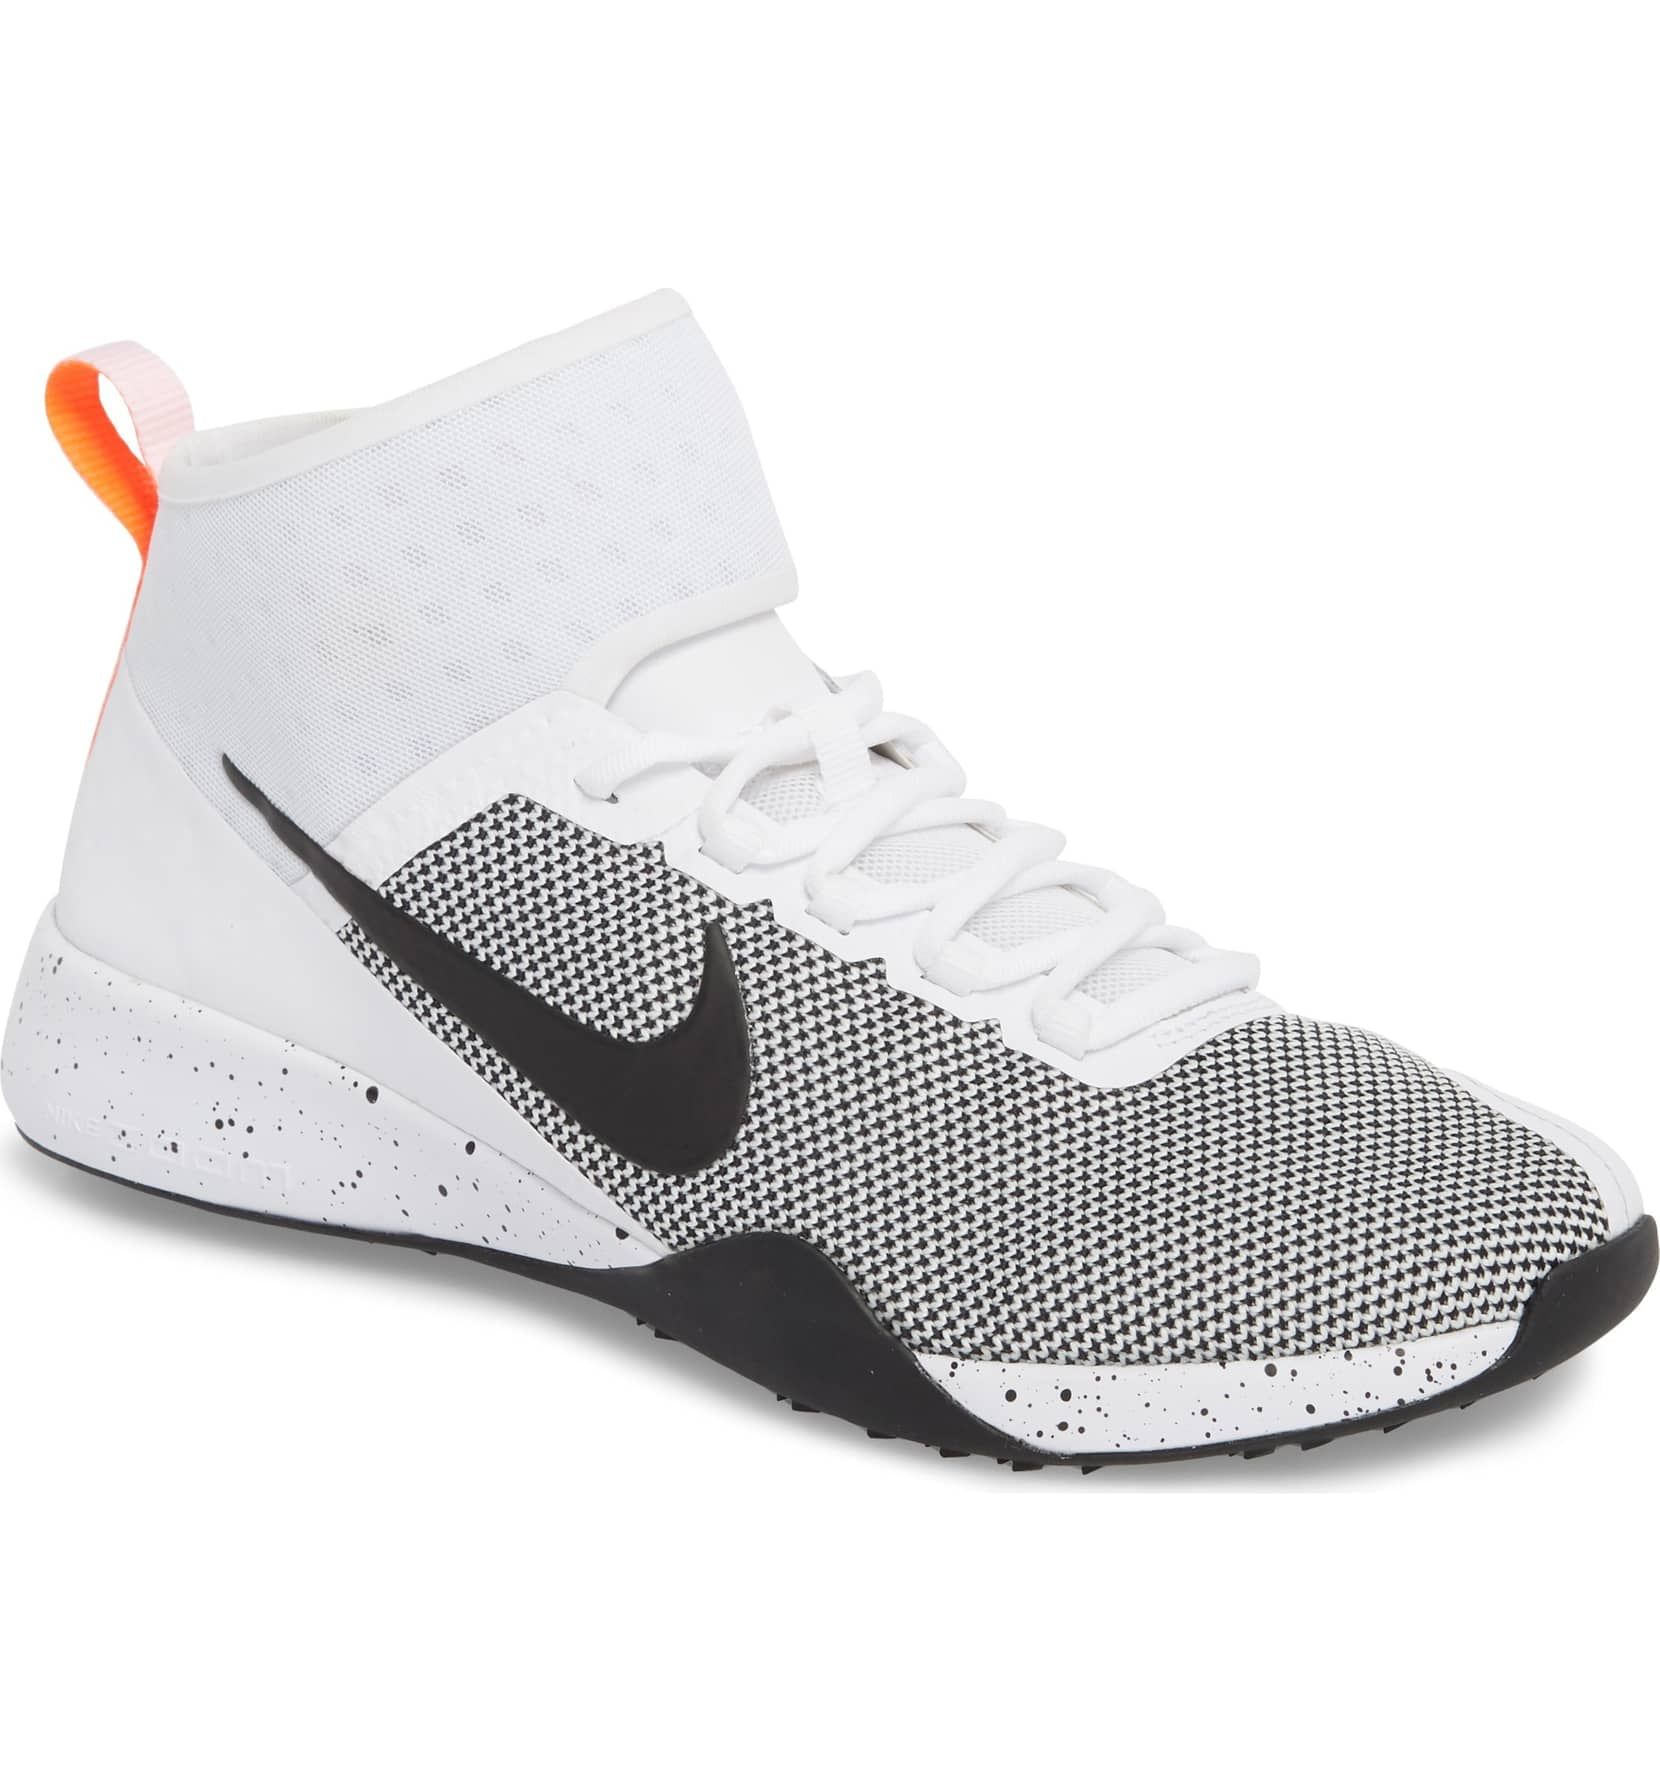 Nike NikeLab Air Zoom Strong 2 Training